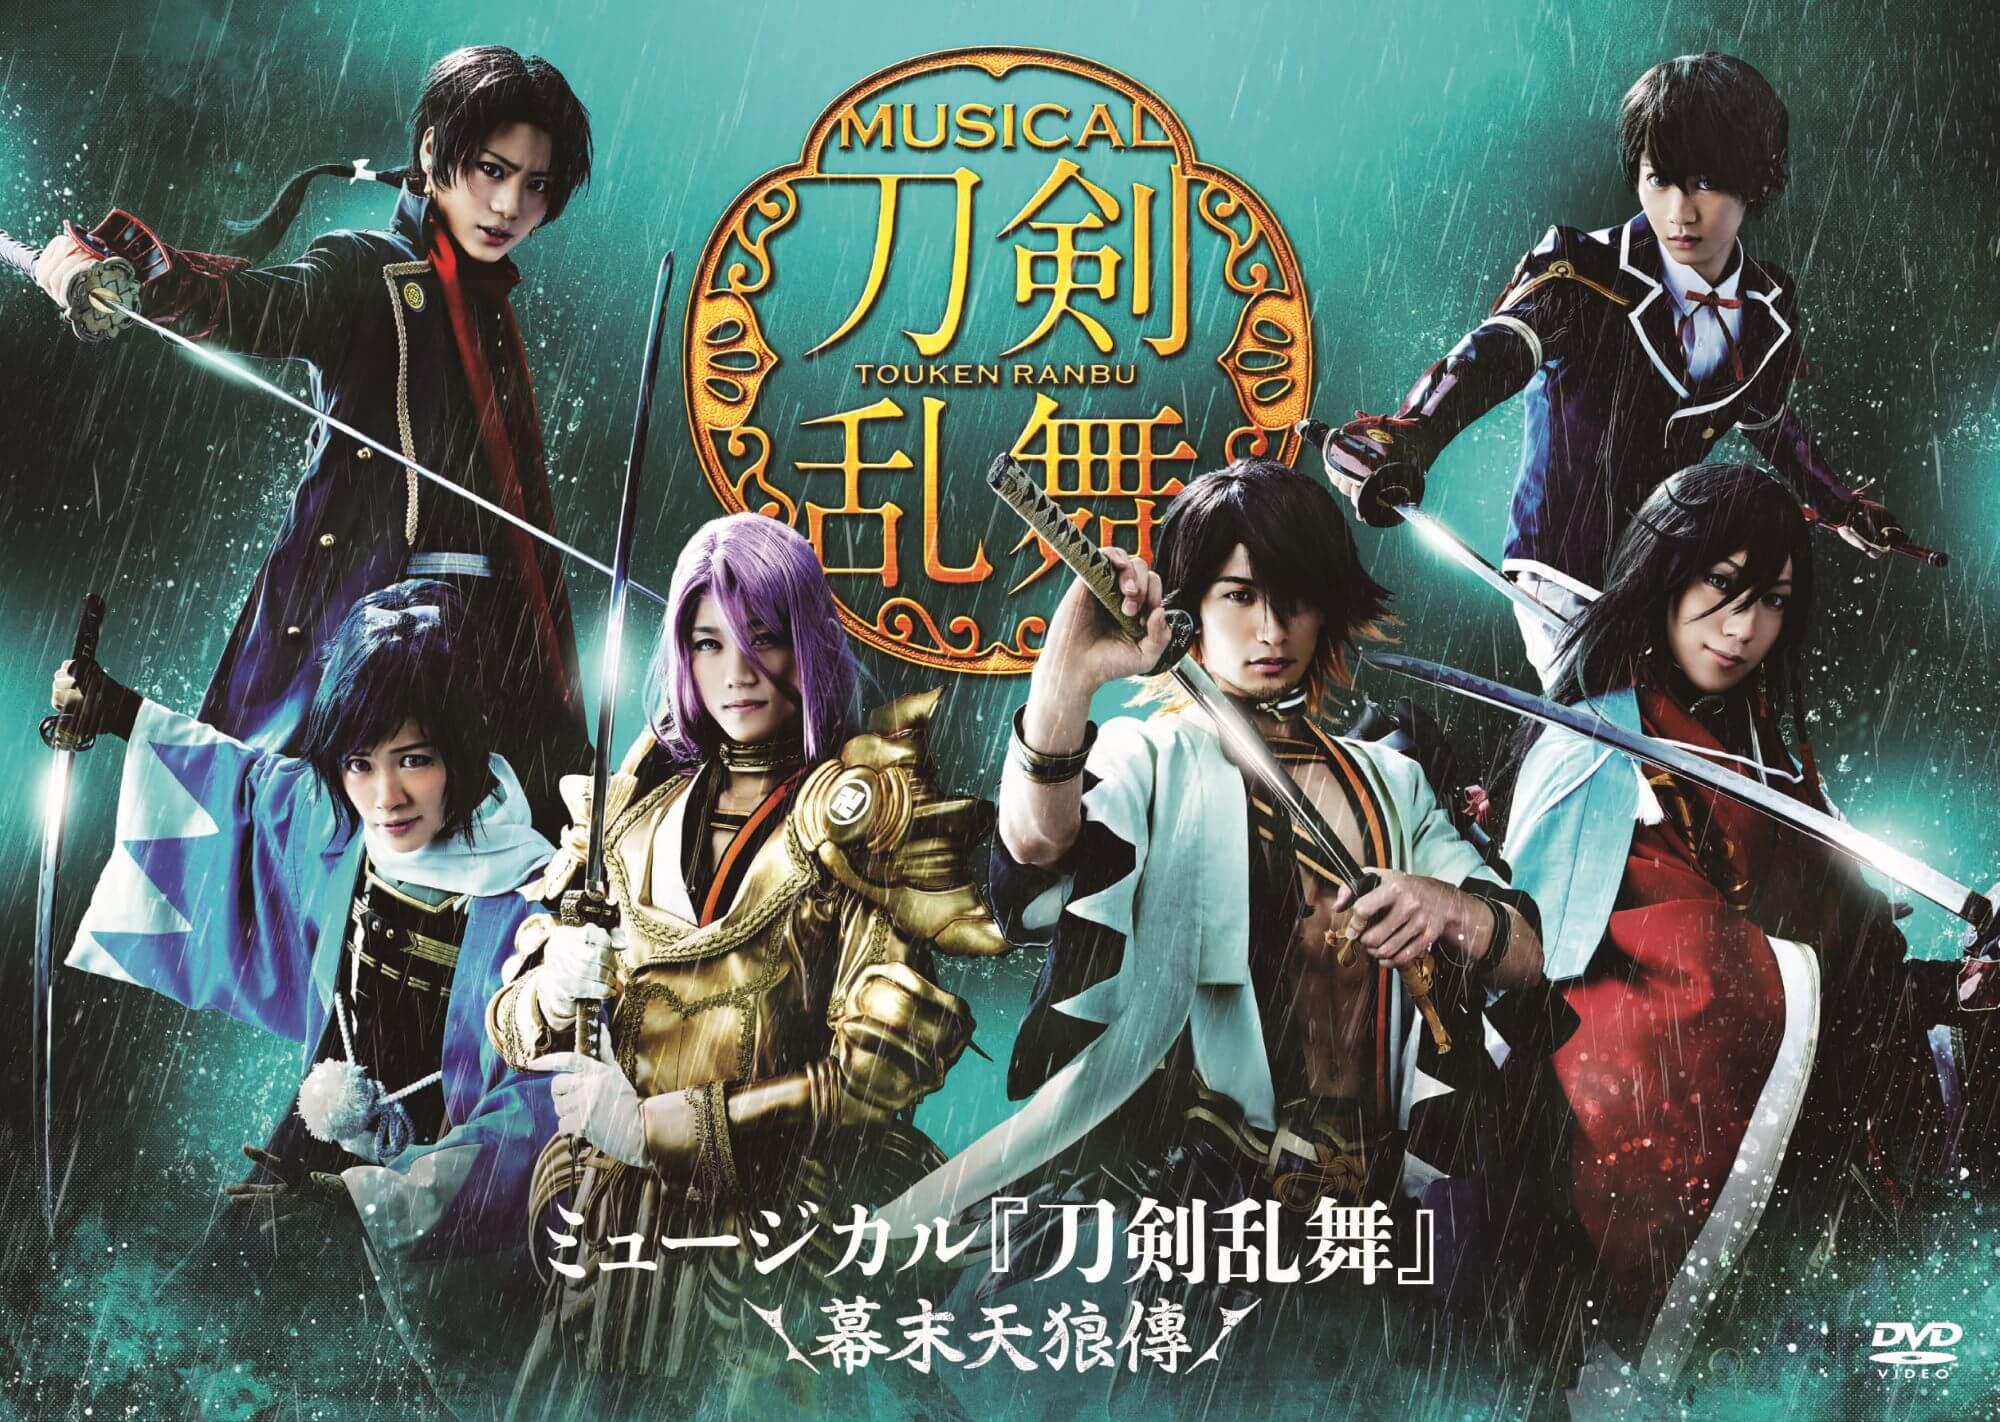 EMPV-5 / ミュージカル『刀剣乱舞』 〜幕末天狼傳〜 / ミュージカル『刀剣乱舞』 / DVD